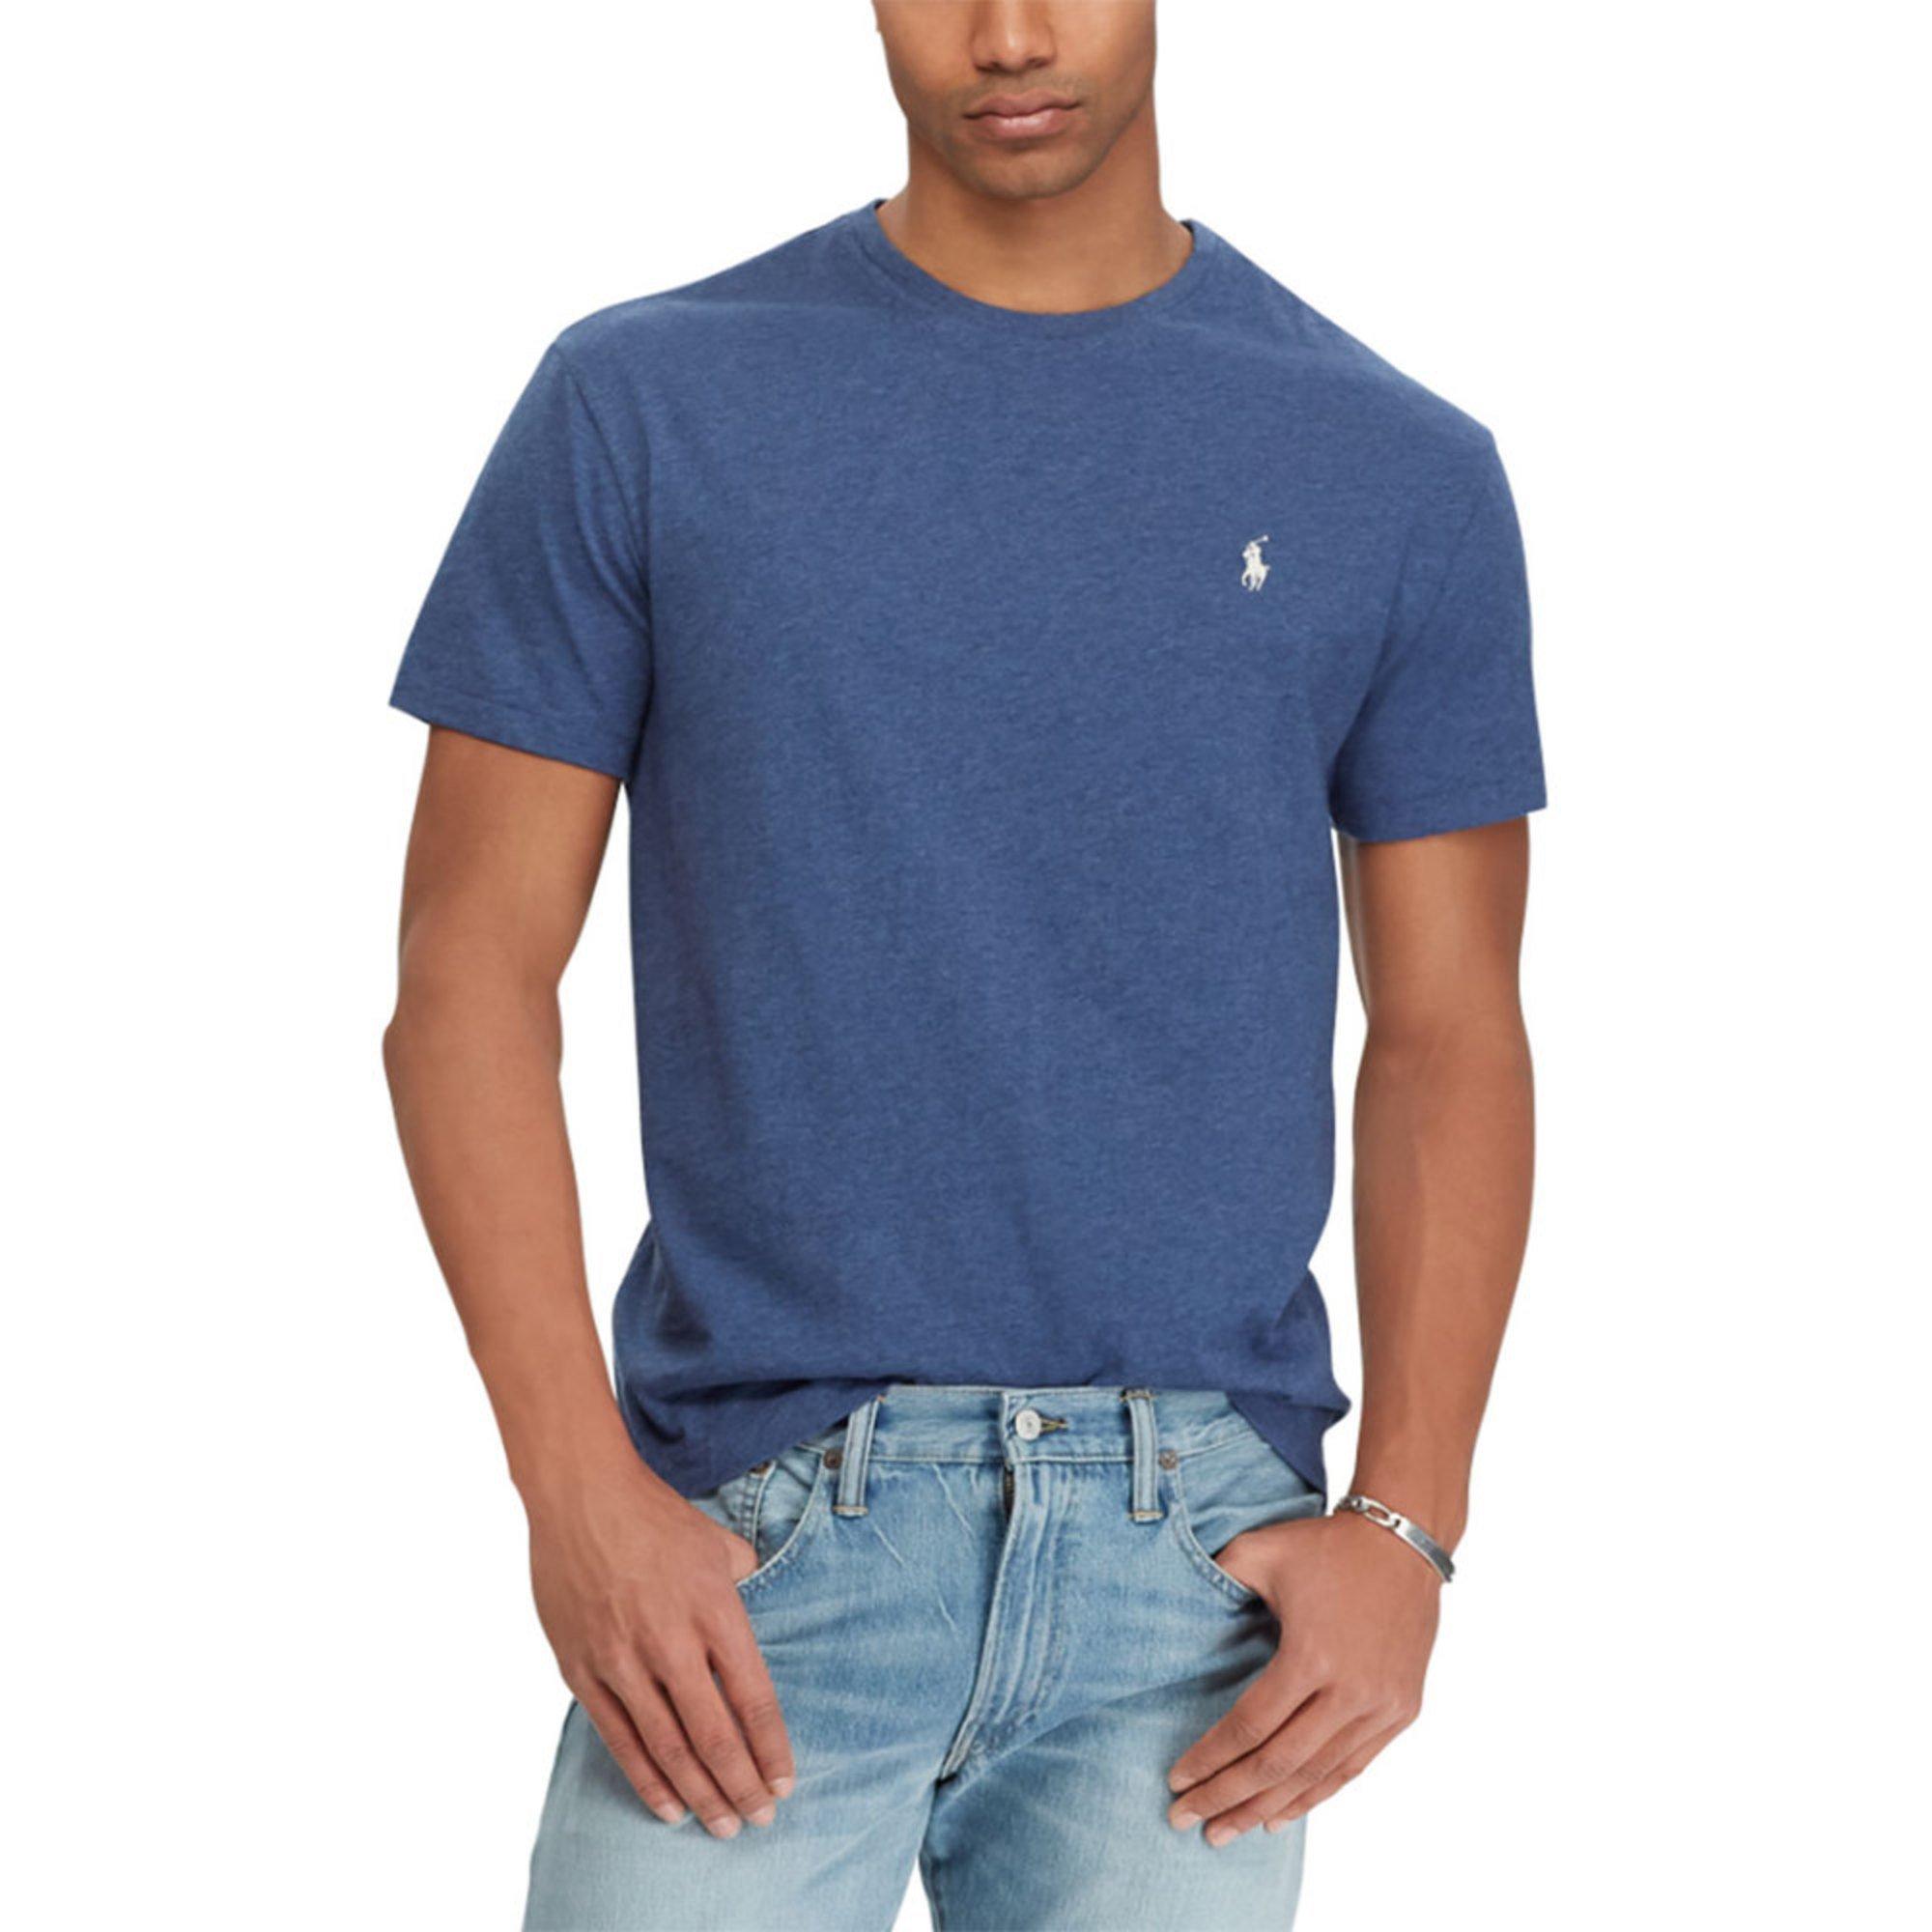 0713af9db7fc Polo Ralph Lauren. Polo Ralph Lauren Men s Short Sleeve Tee Crew Neck Pocket  ...